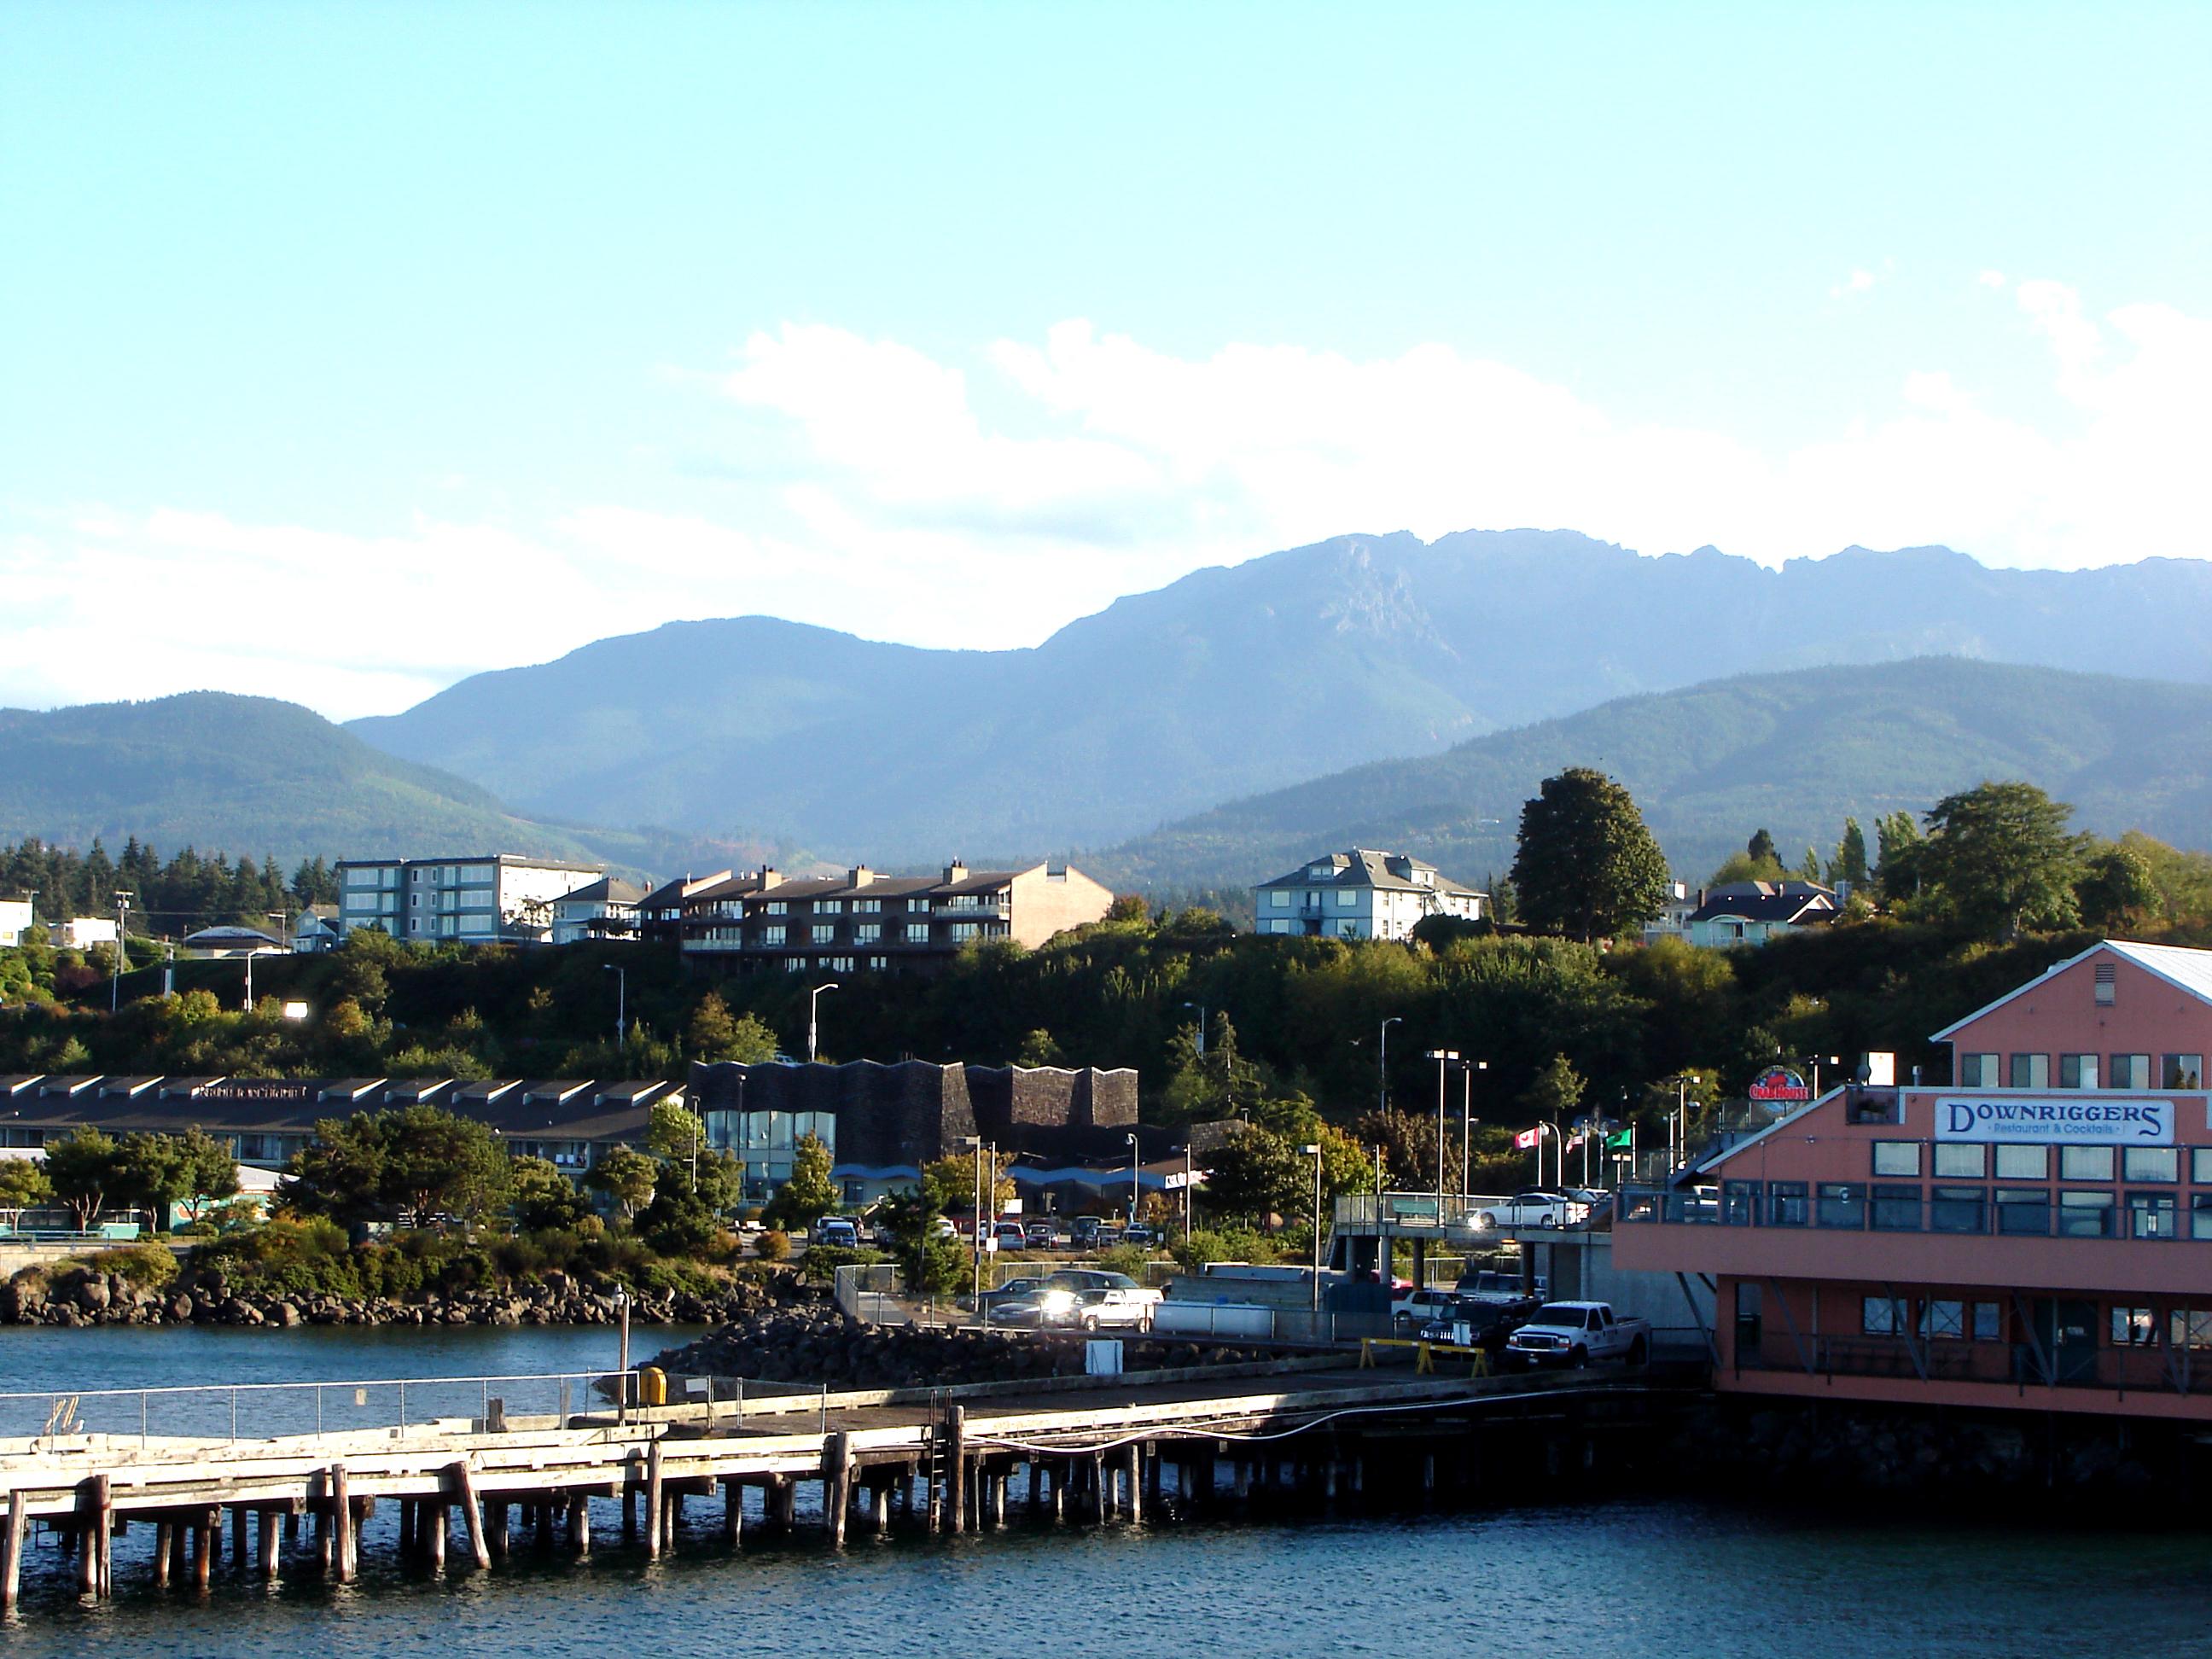 Port Angeles WA